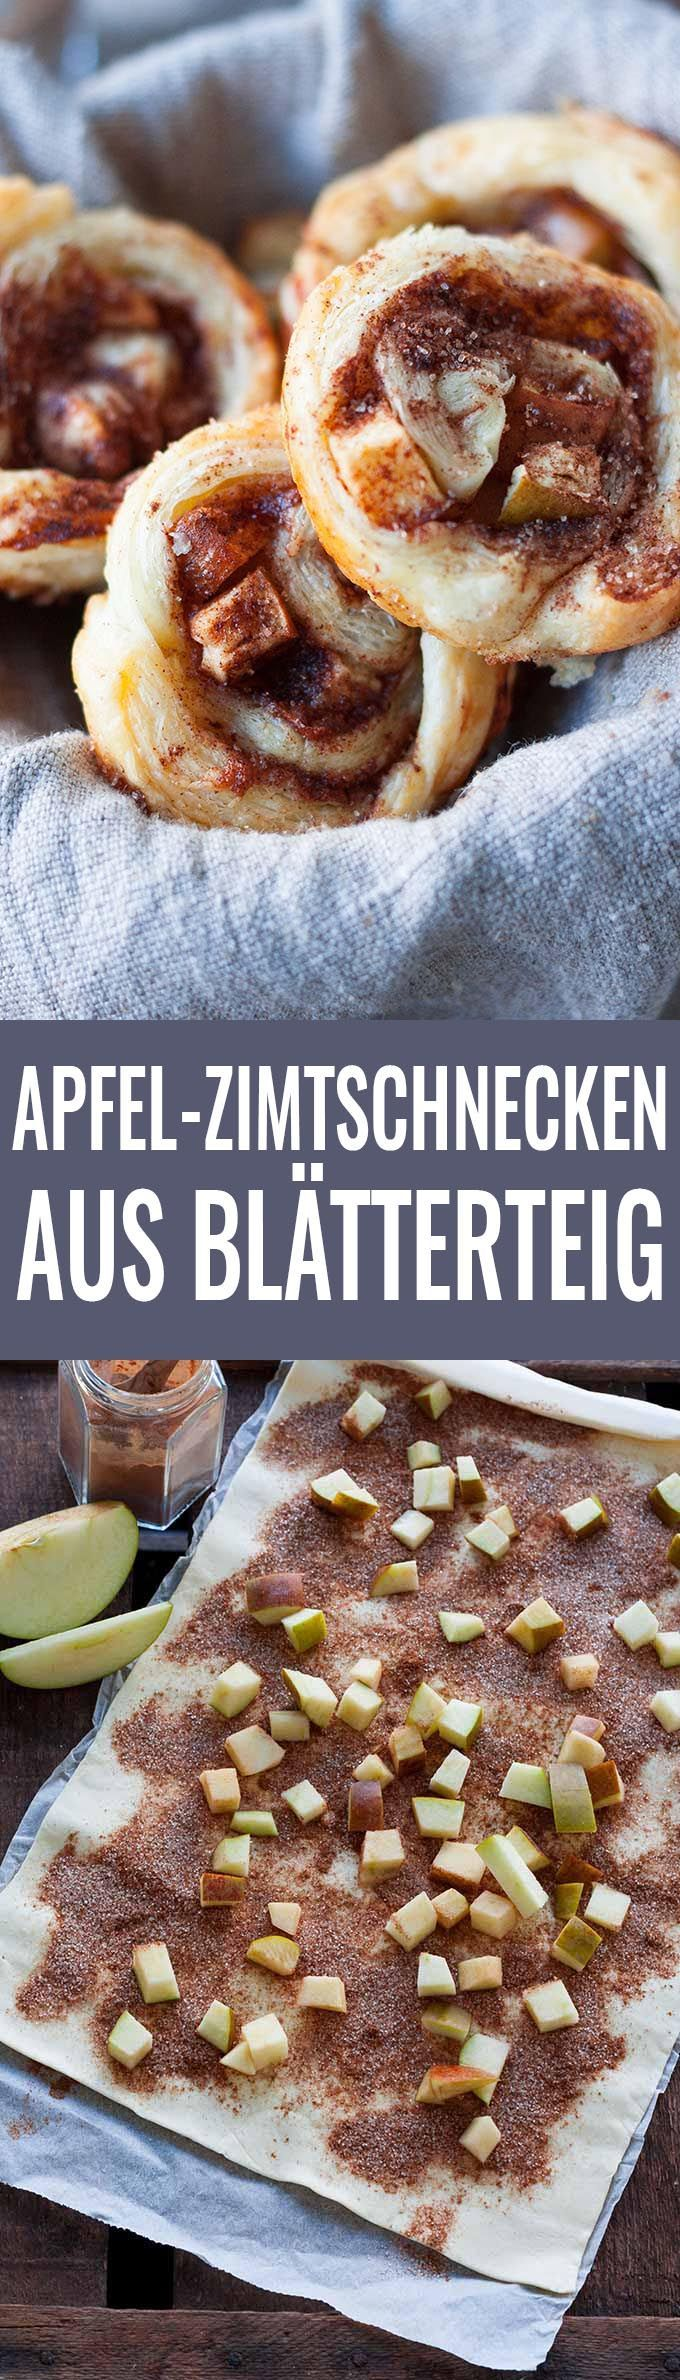 best 20 fingerfood dessert ideas on pinterest apple rose pastry apple baking recipes and. Black Bedroom Furniture Sets. Home Design Ideas